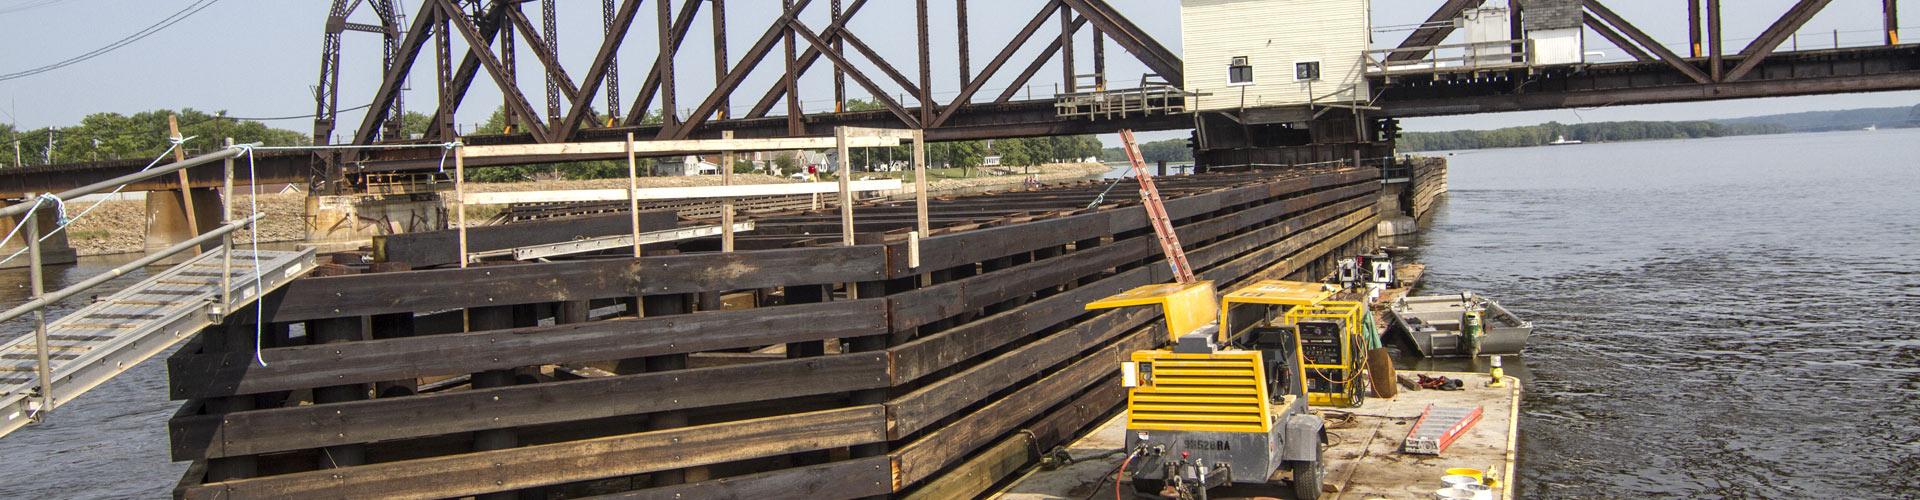 bridge demolition, timber cribbing repairs, railroad bridge fender systems, railroad bridge repairs, railroad contractor